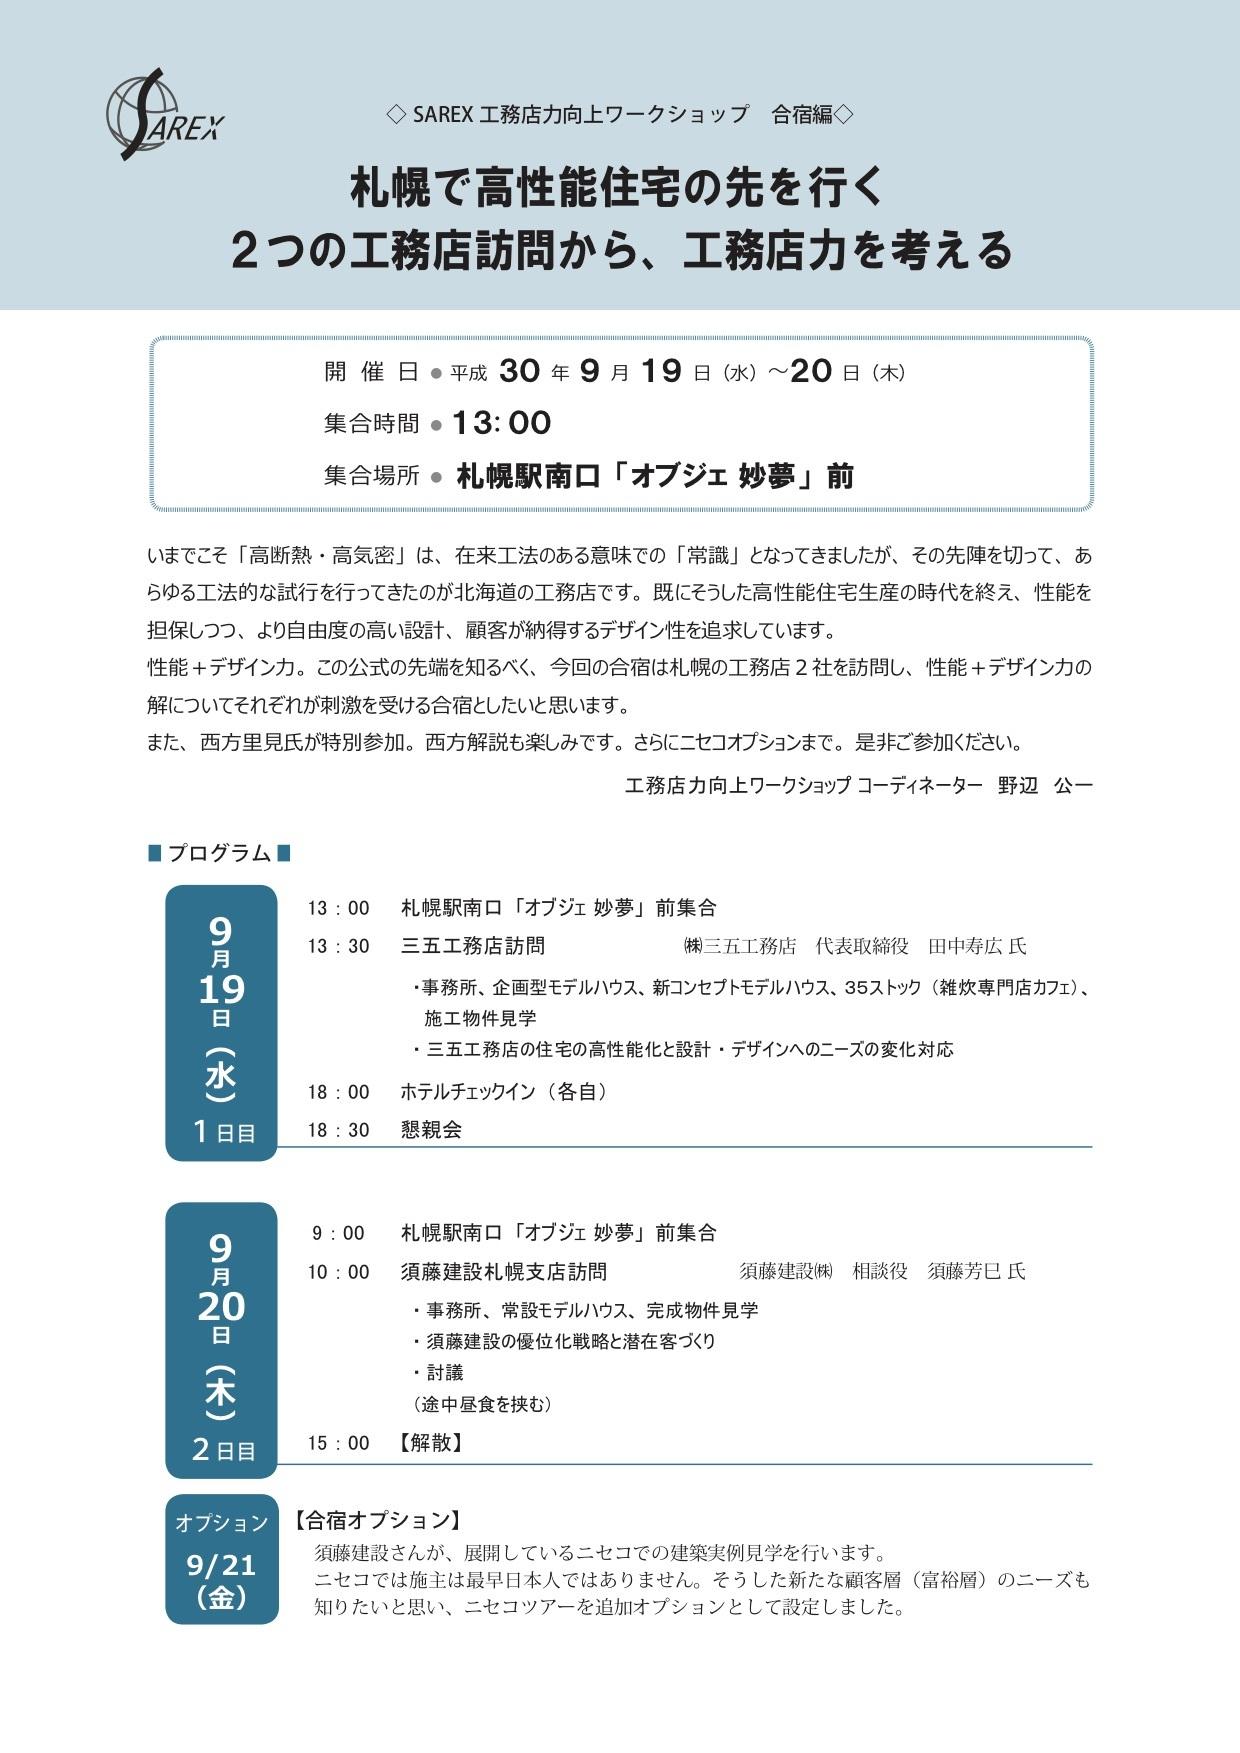 SAREX 北海道に渡る 札幌 ニセコ_e0054299_19131785.jpg